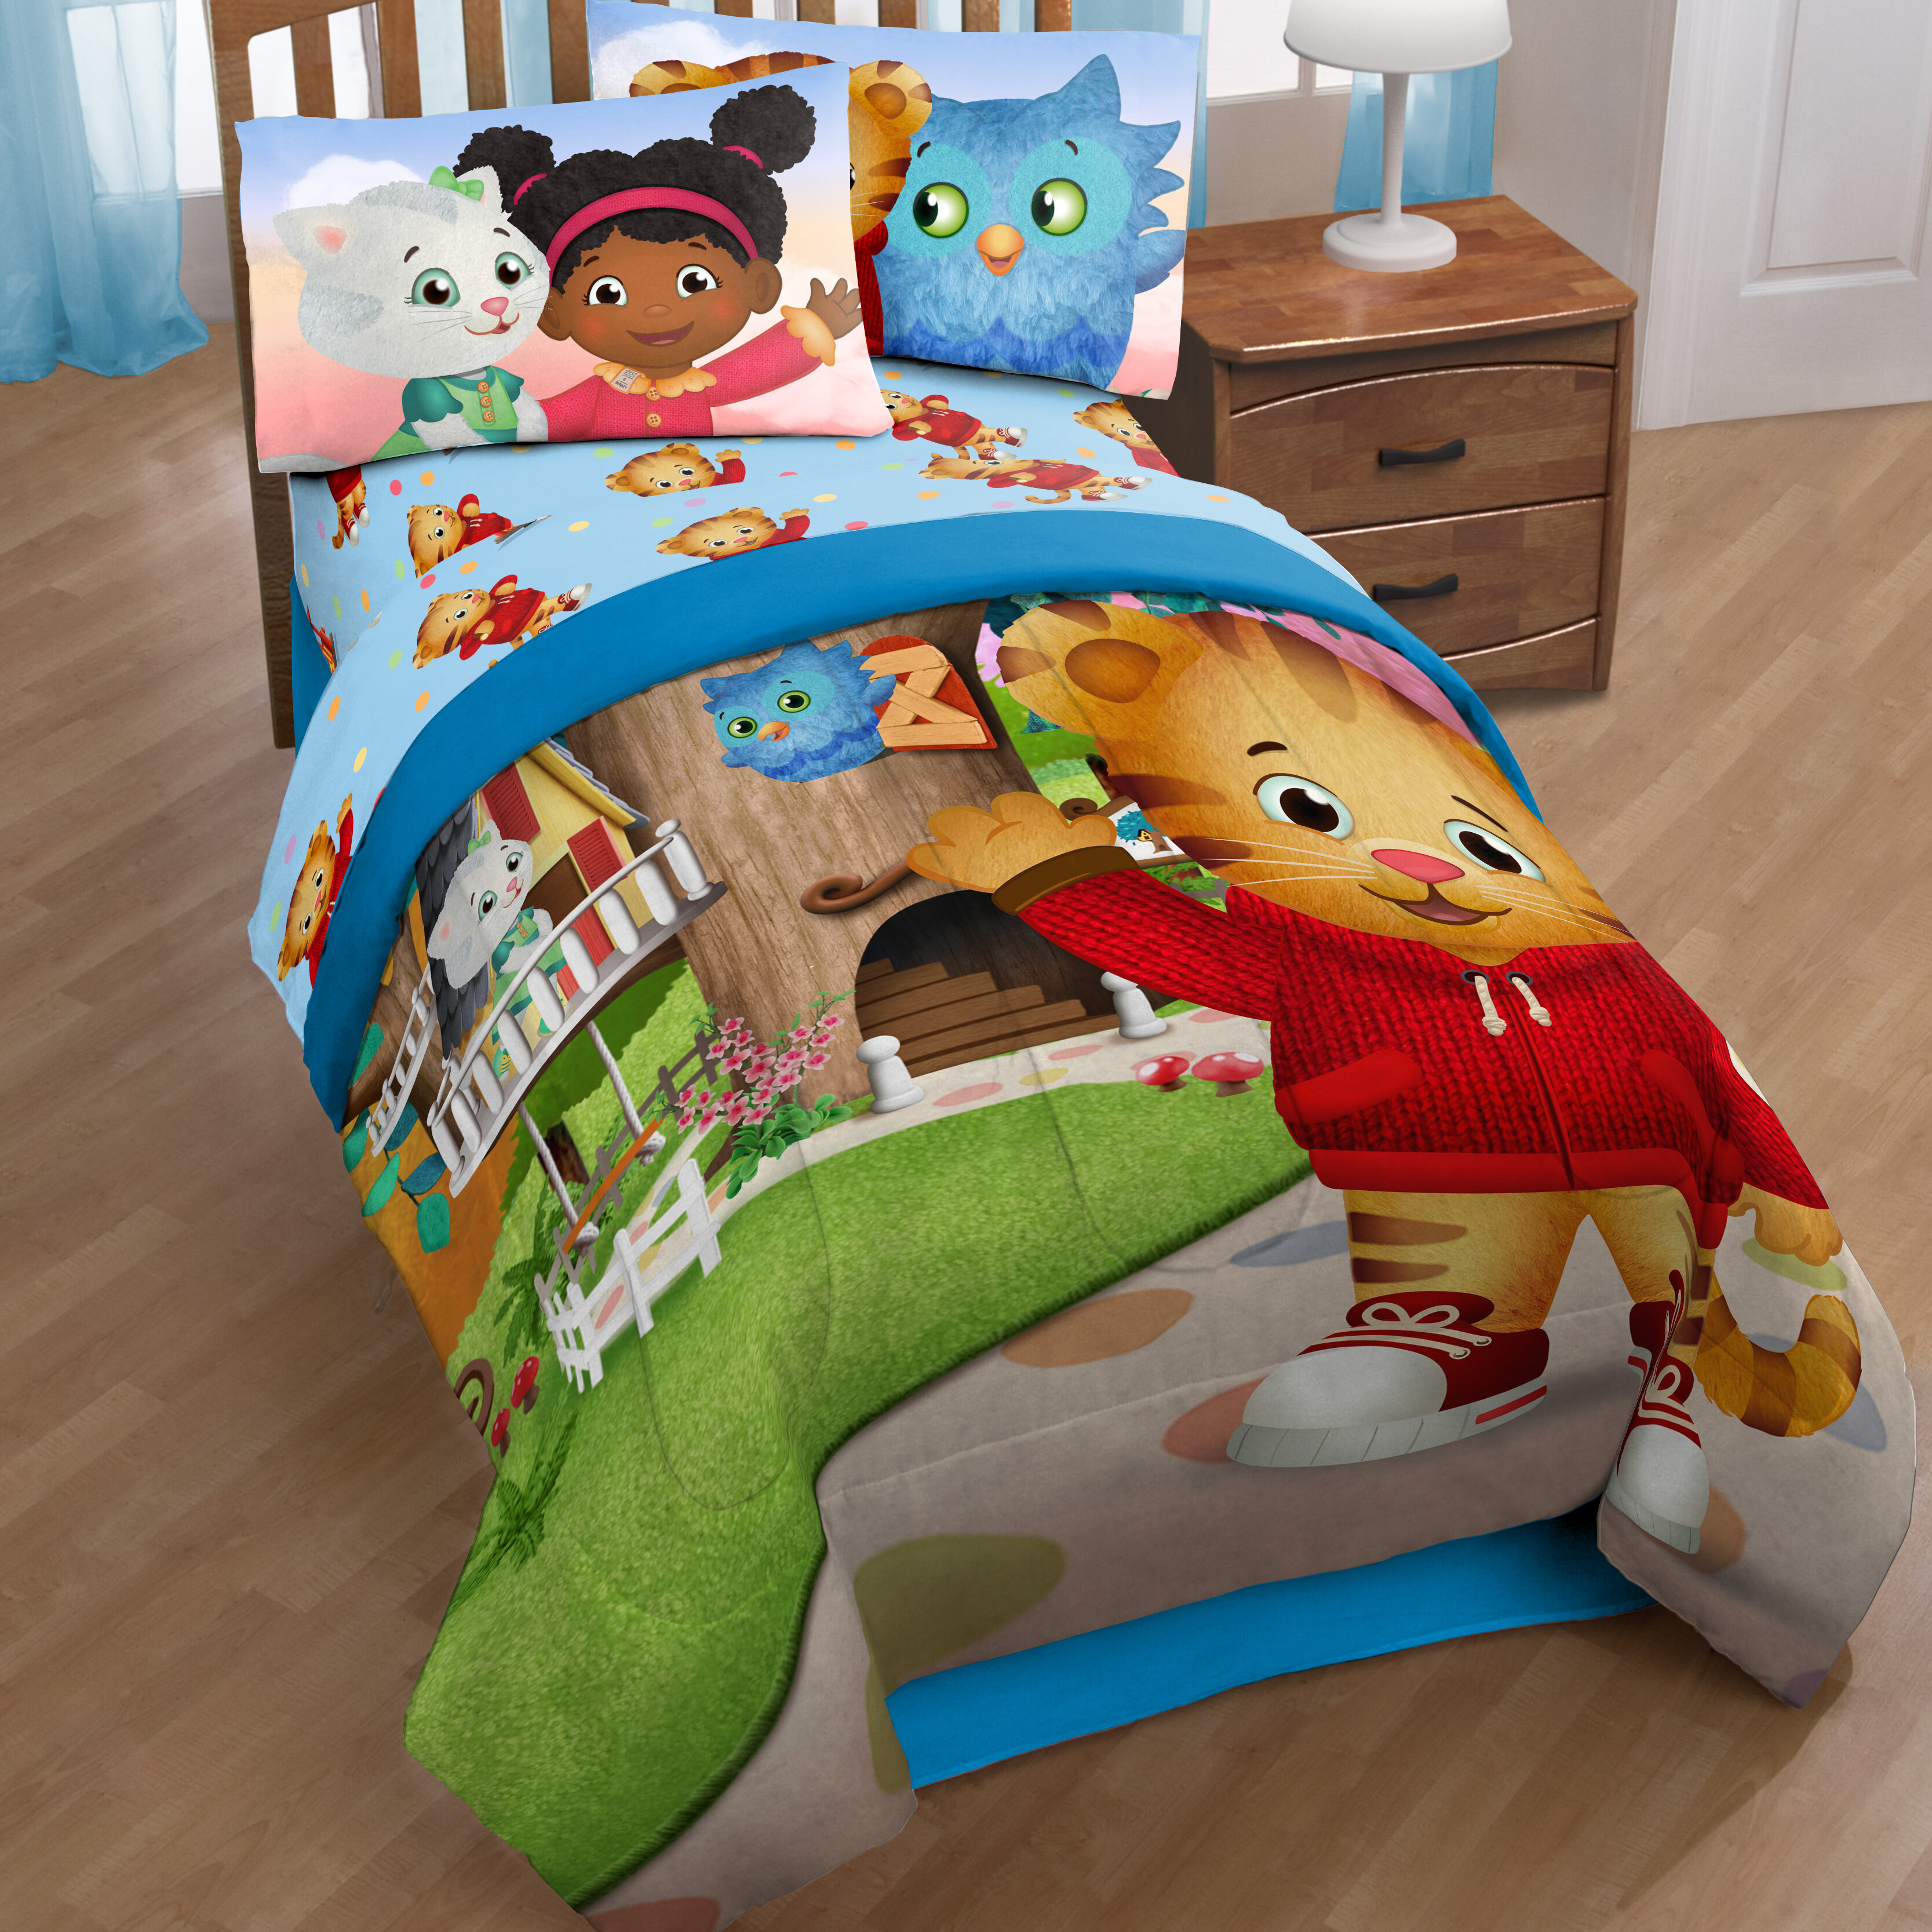 Toddler Bedding You Ll Love Wayfair